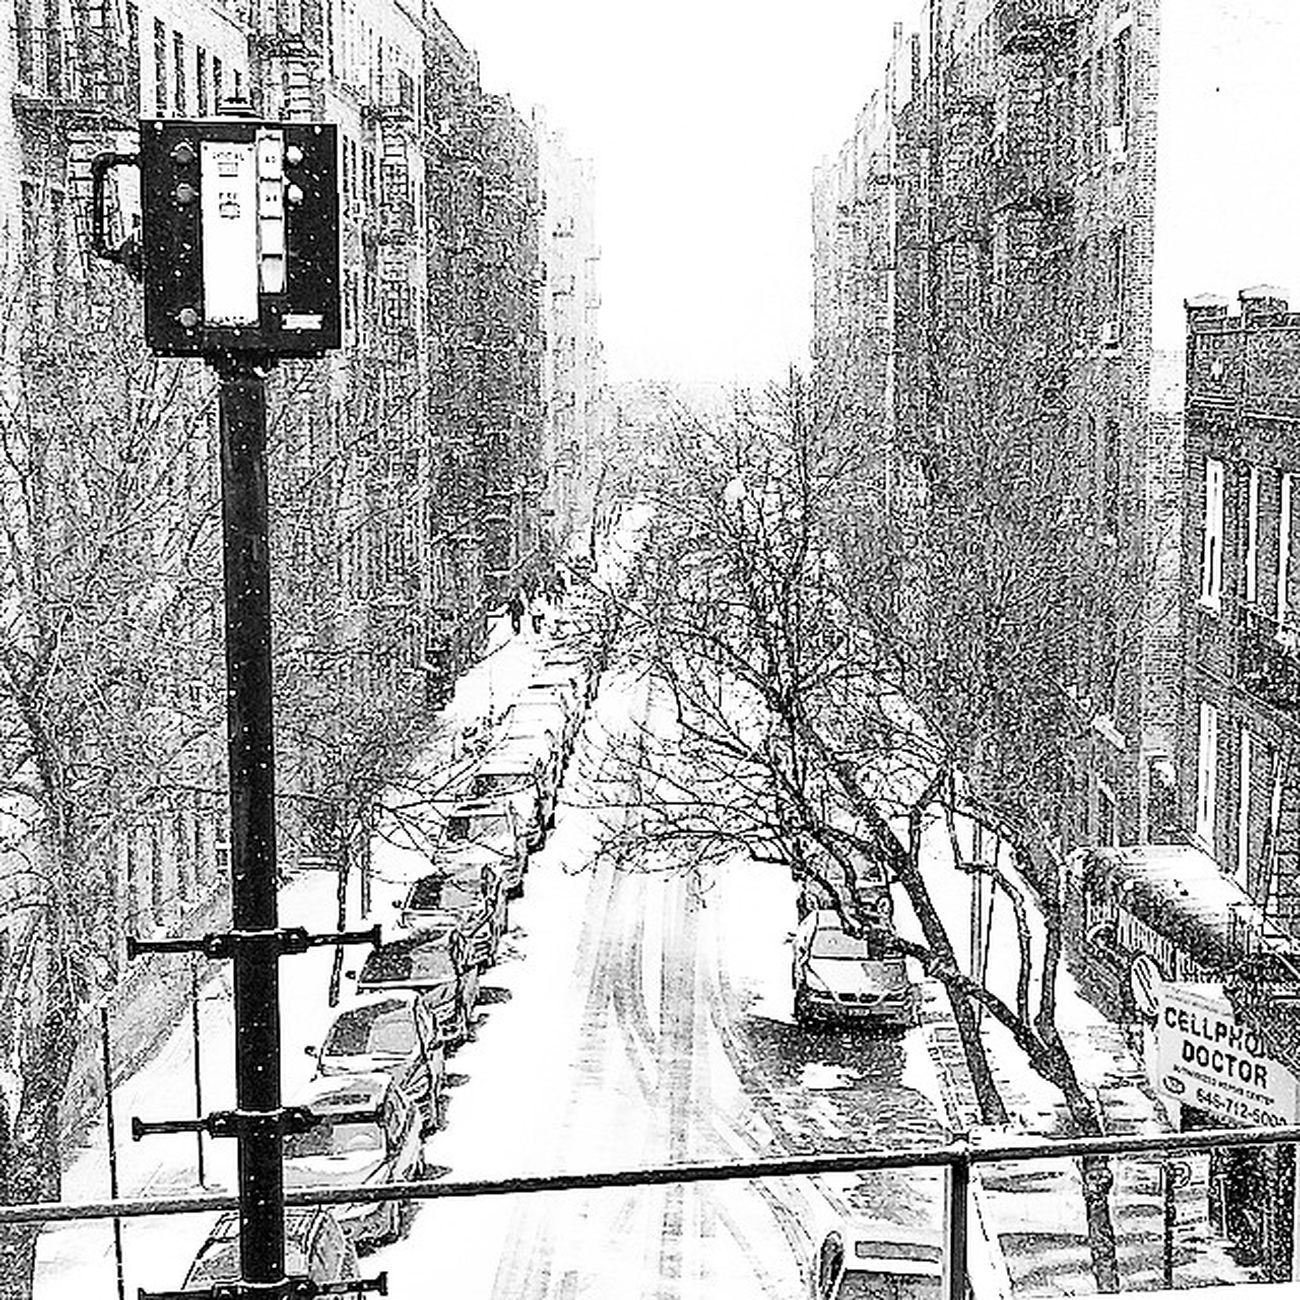 The storms a comin!! ❄️❄️❄️ Brightonbeach Brooklyn NYC Snowstorm Juno Blackandwhite Bw Instantartist